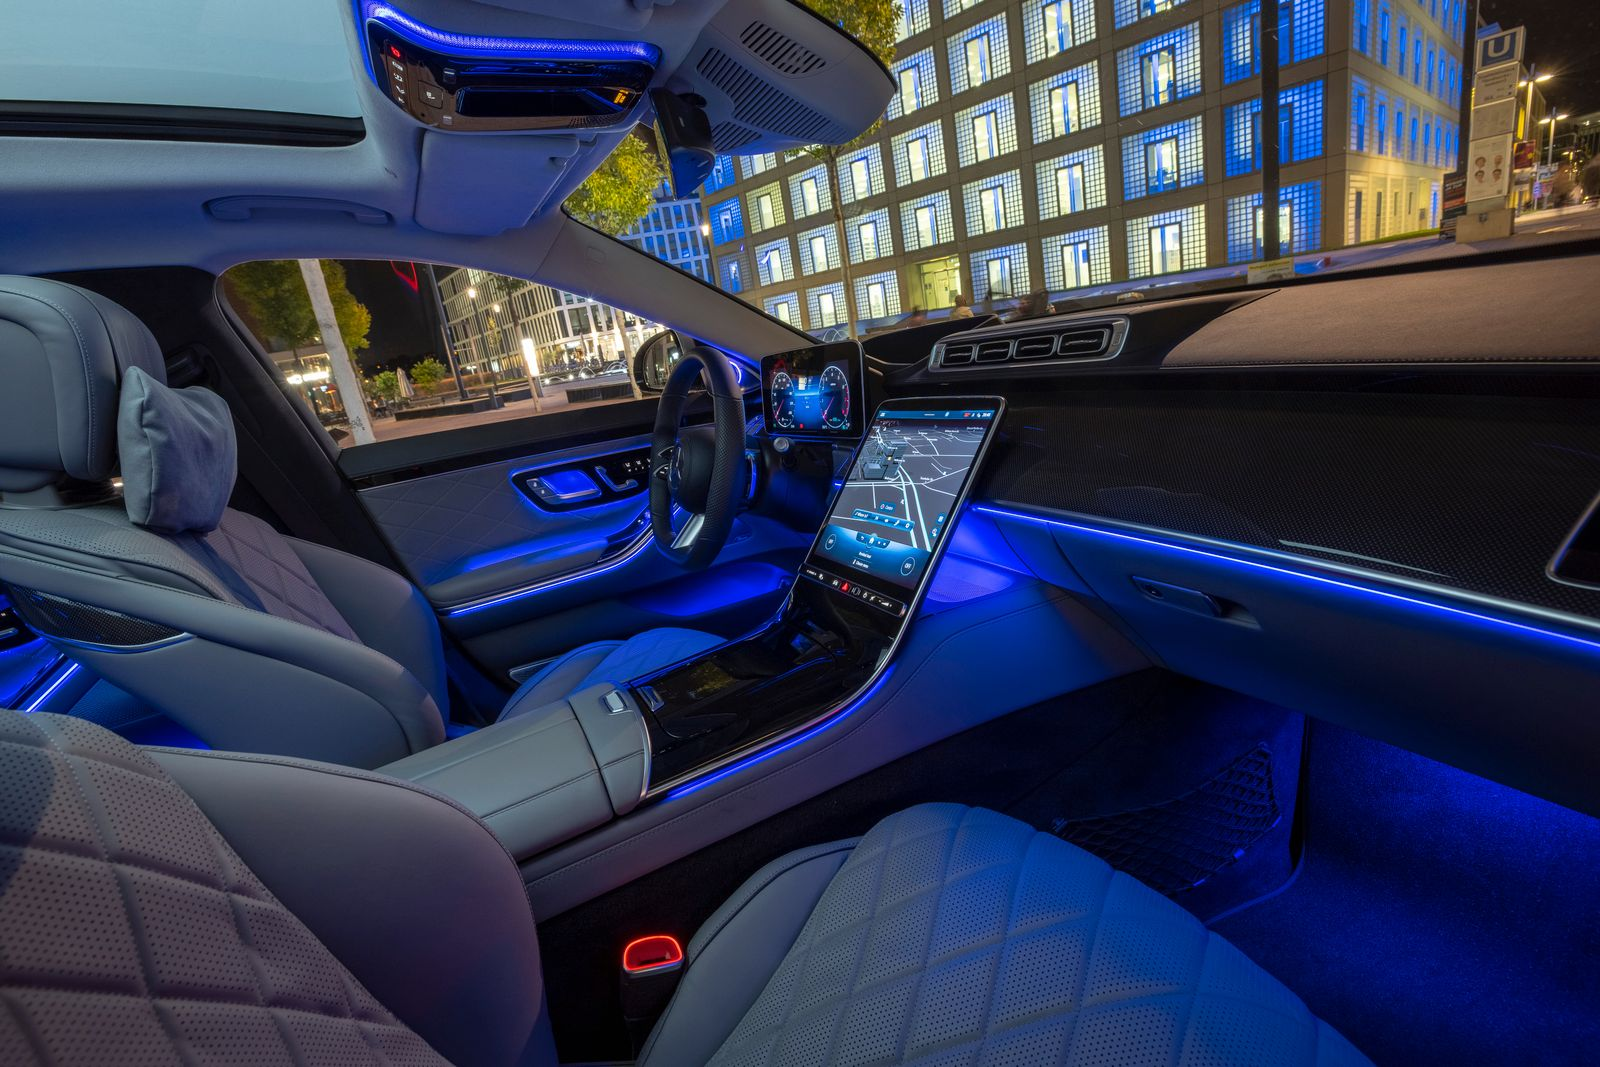 Mercedes-Benz S-Klasse Presse Fahrvorstellung. Immendingen 2020// Mercedes-Benz S-Class press test drive. Immendingen 2020